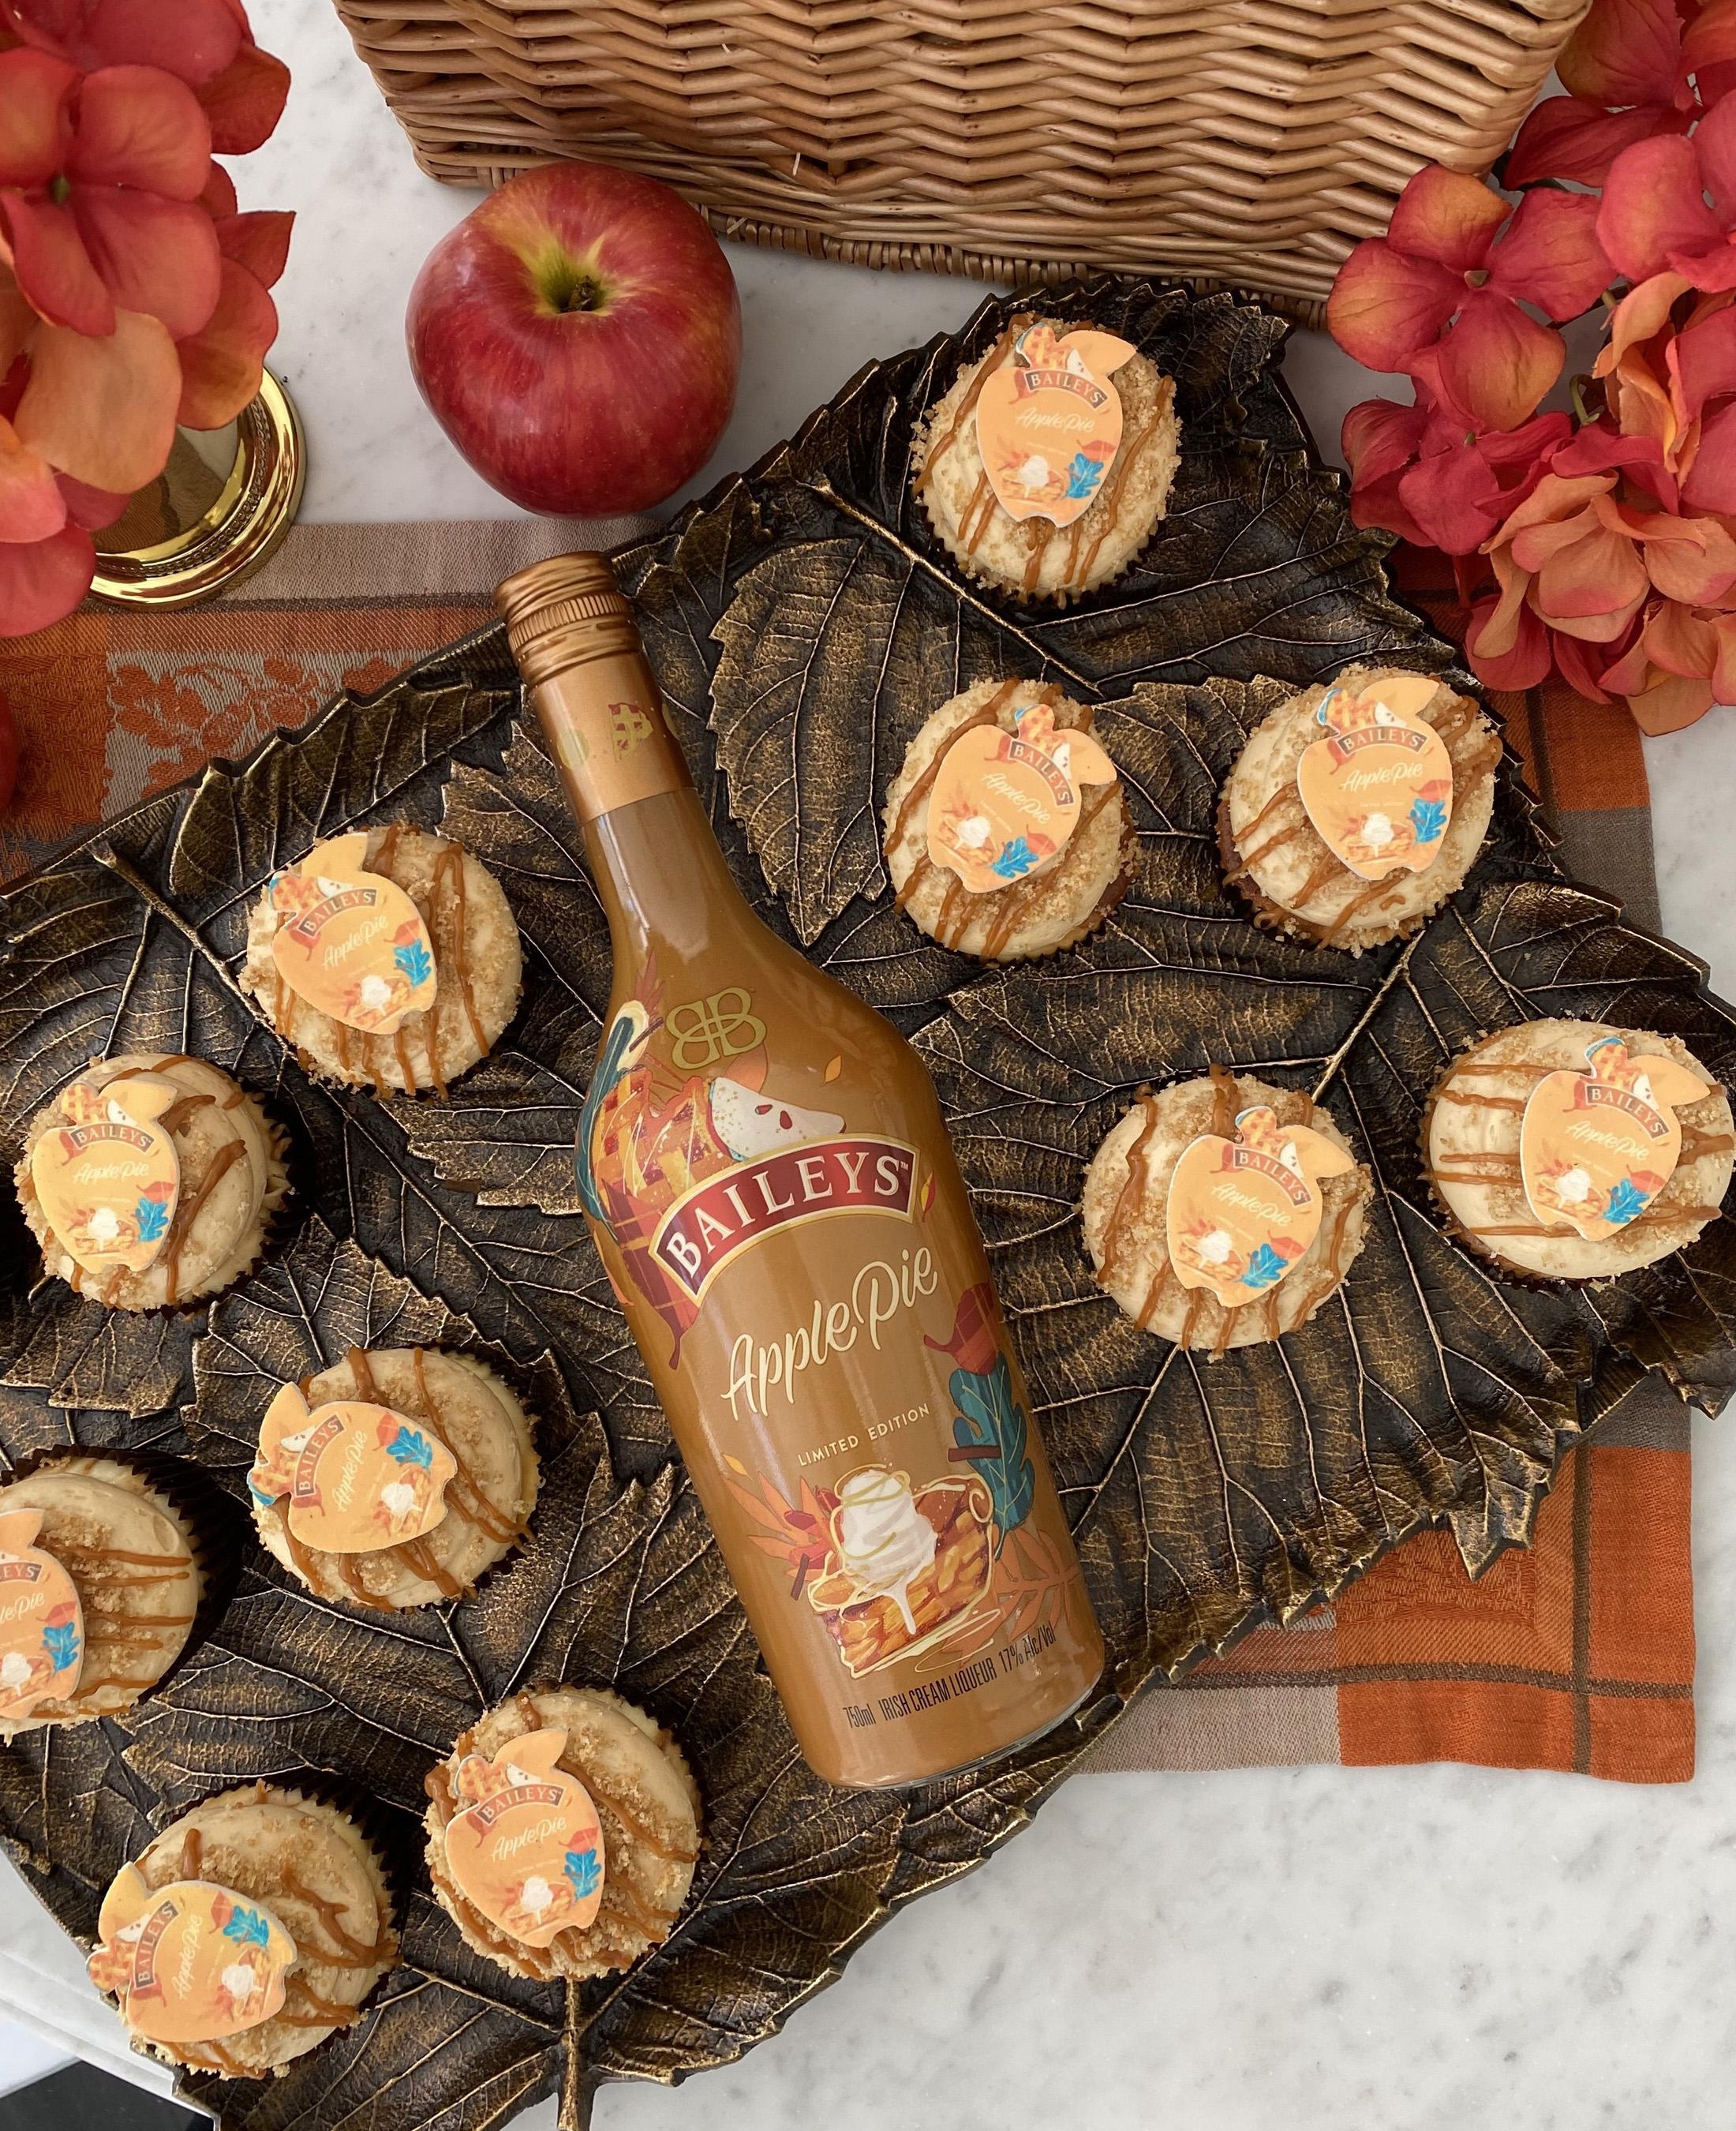 Georgetown Cupcake, Baileys Caramel Apple Pie